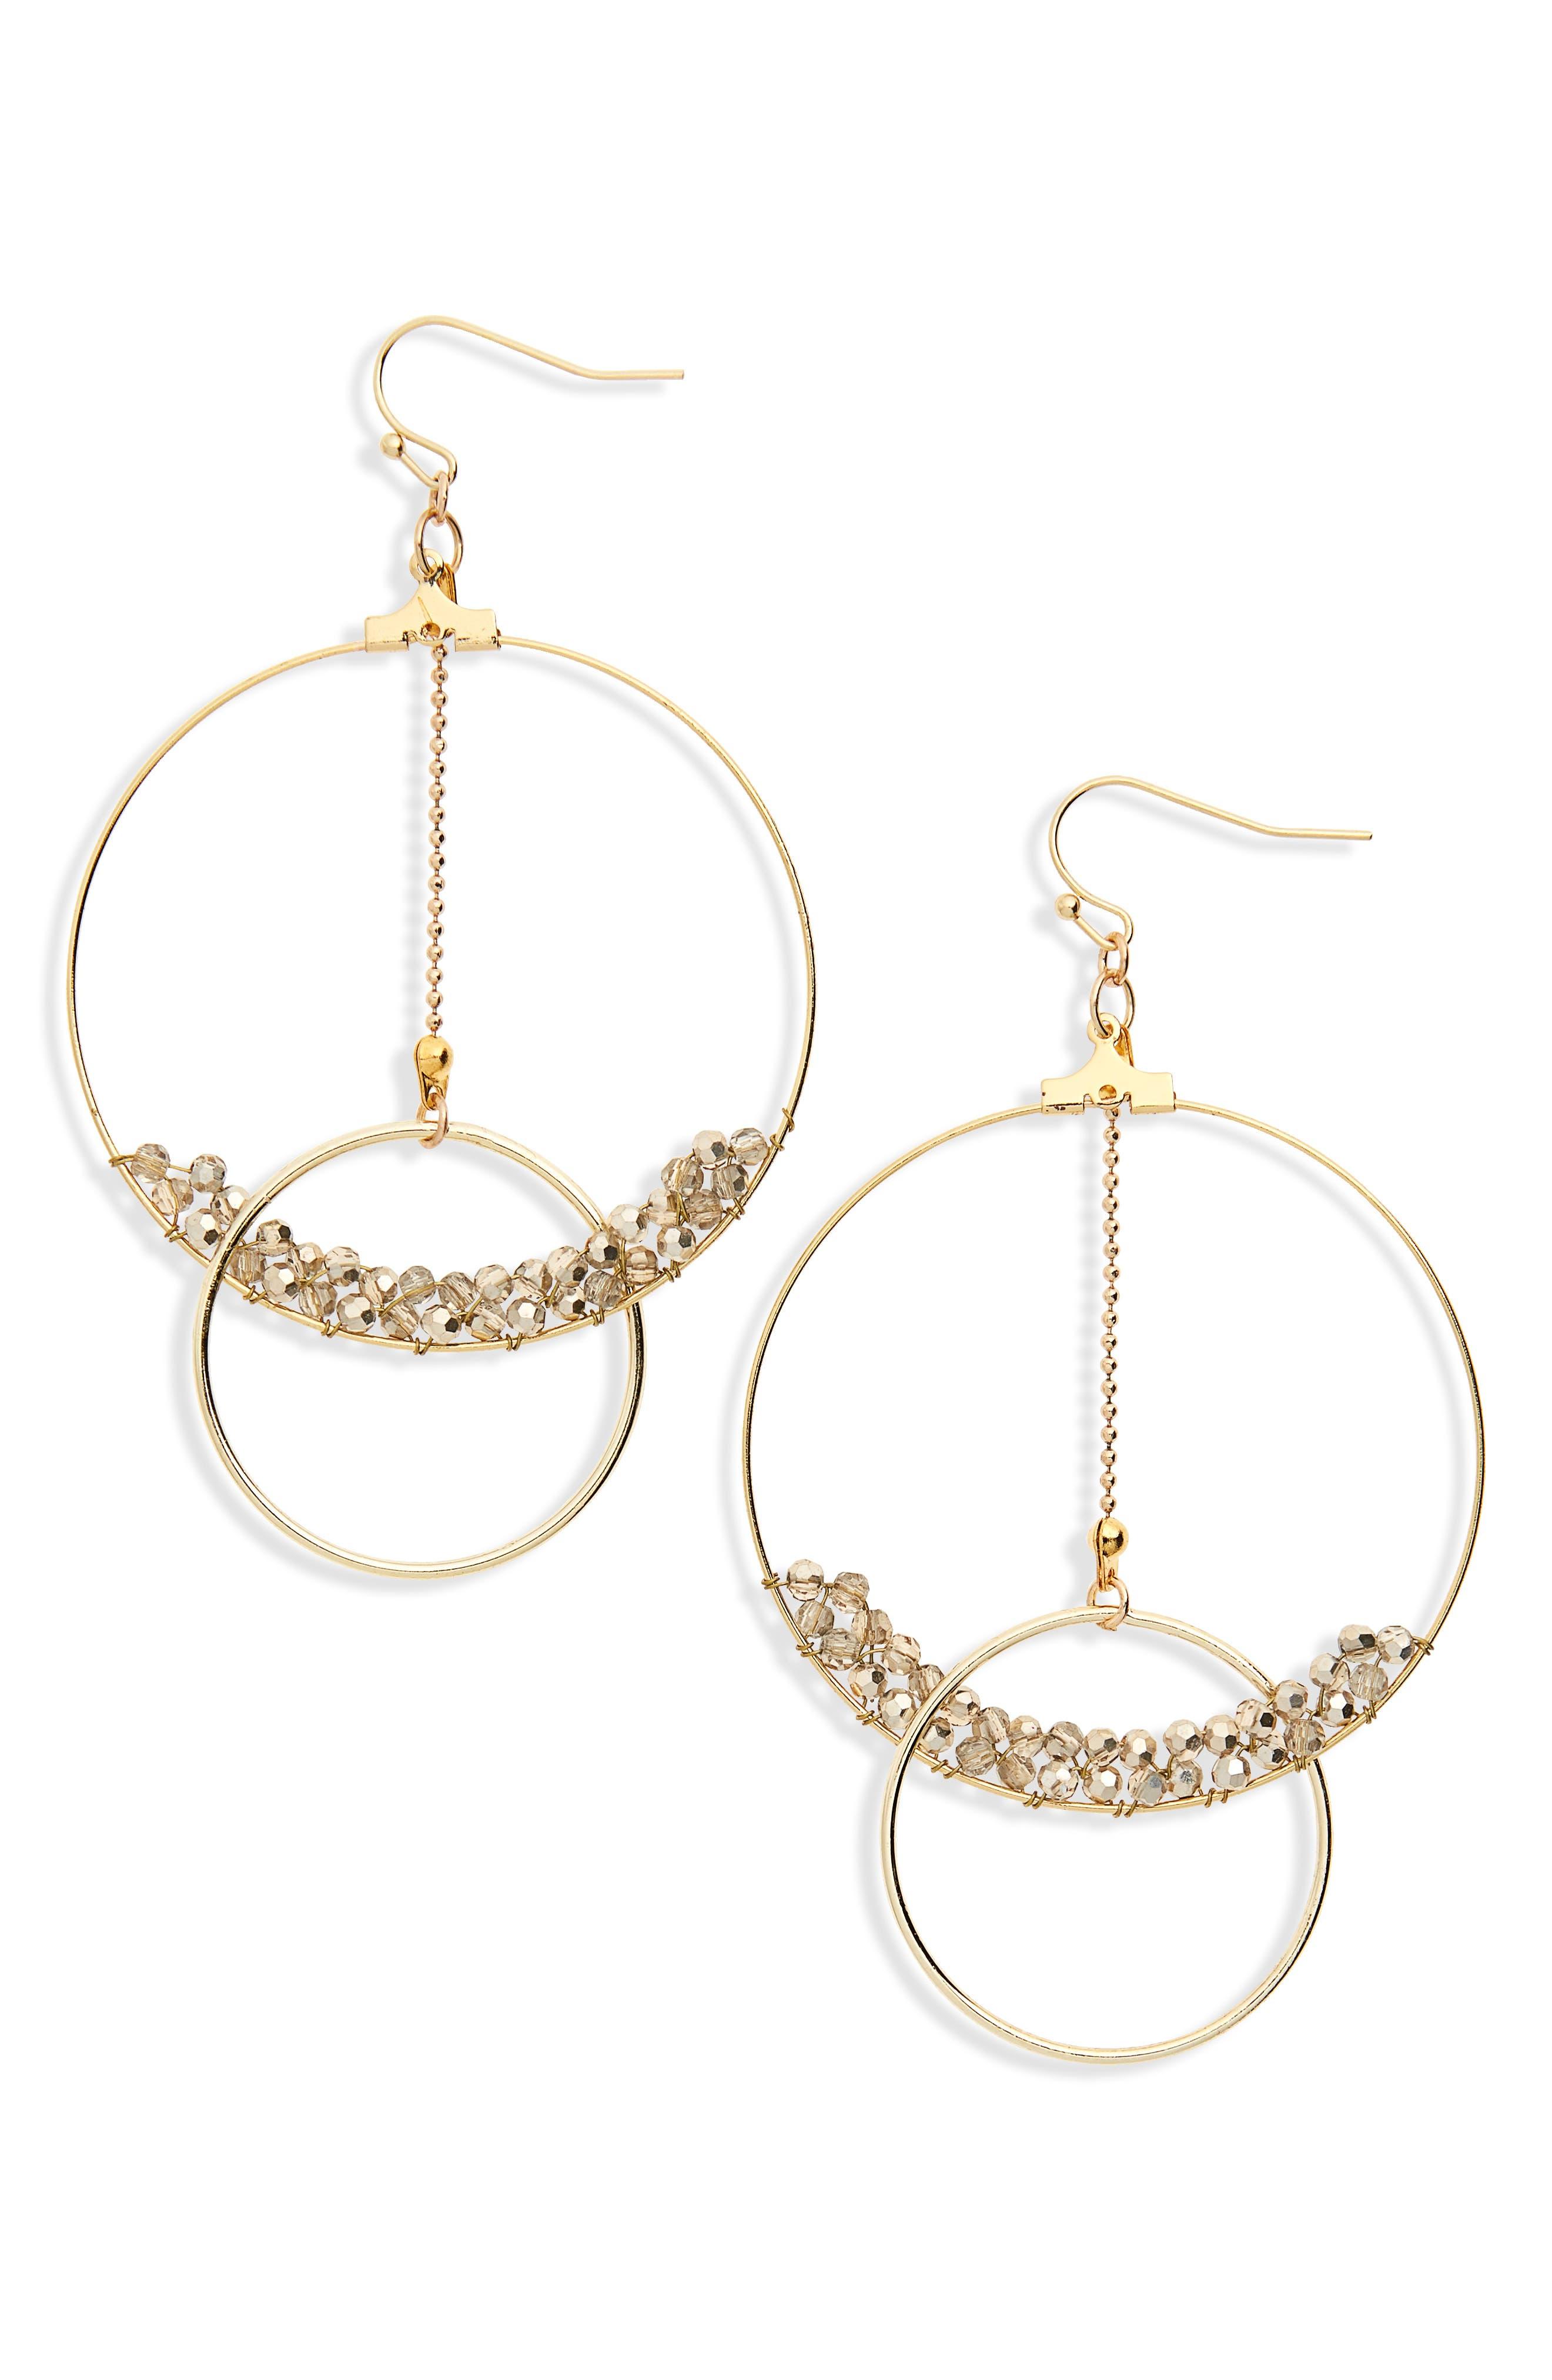 Crystal Beaded Lyrd Circle Earrings,                             Main thumbnail 1, color,                             710